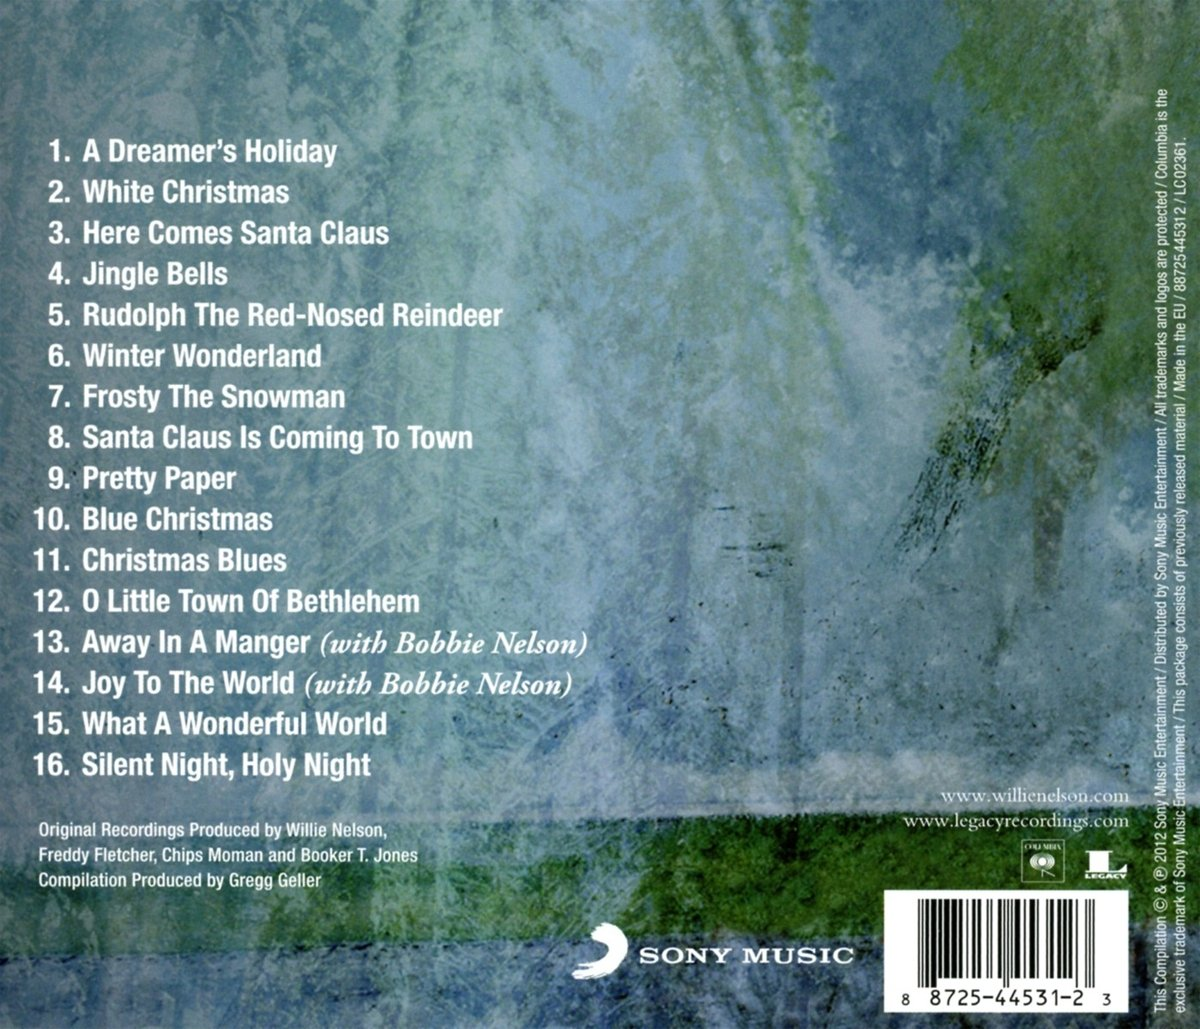 Willie Nelson - The Classic Christmas Album - Amazon.com Music